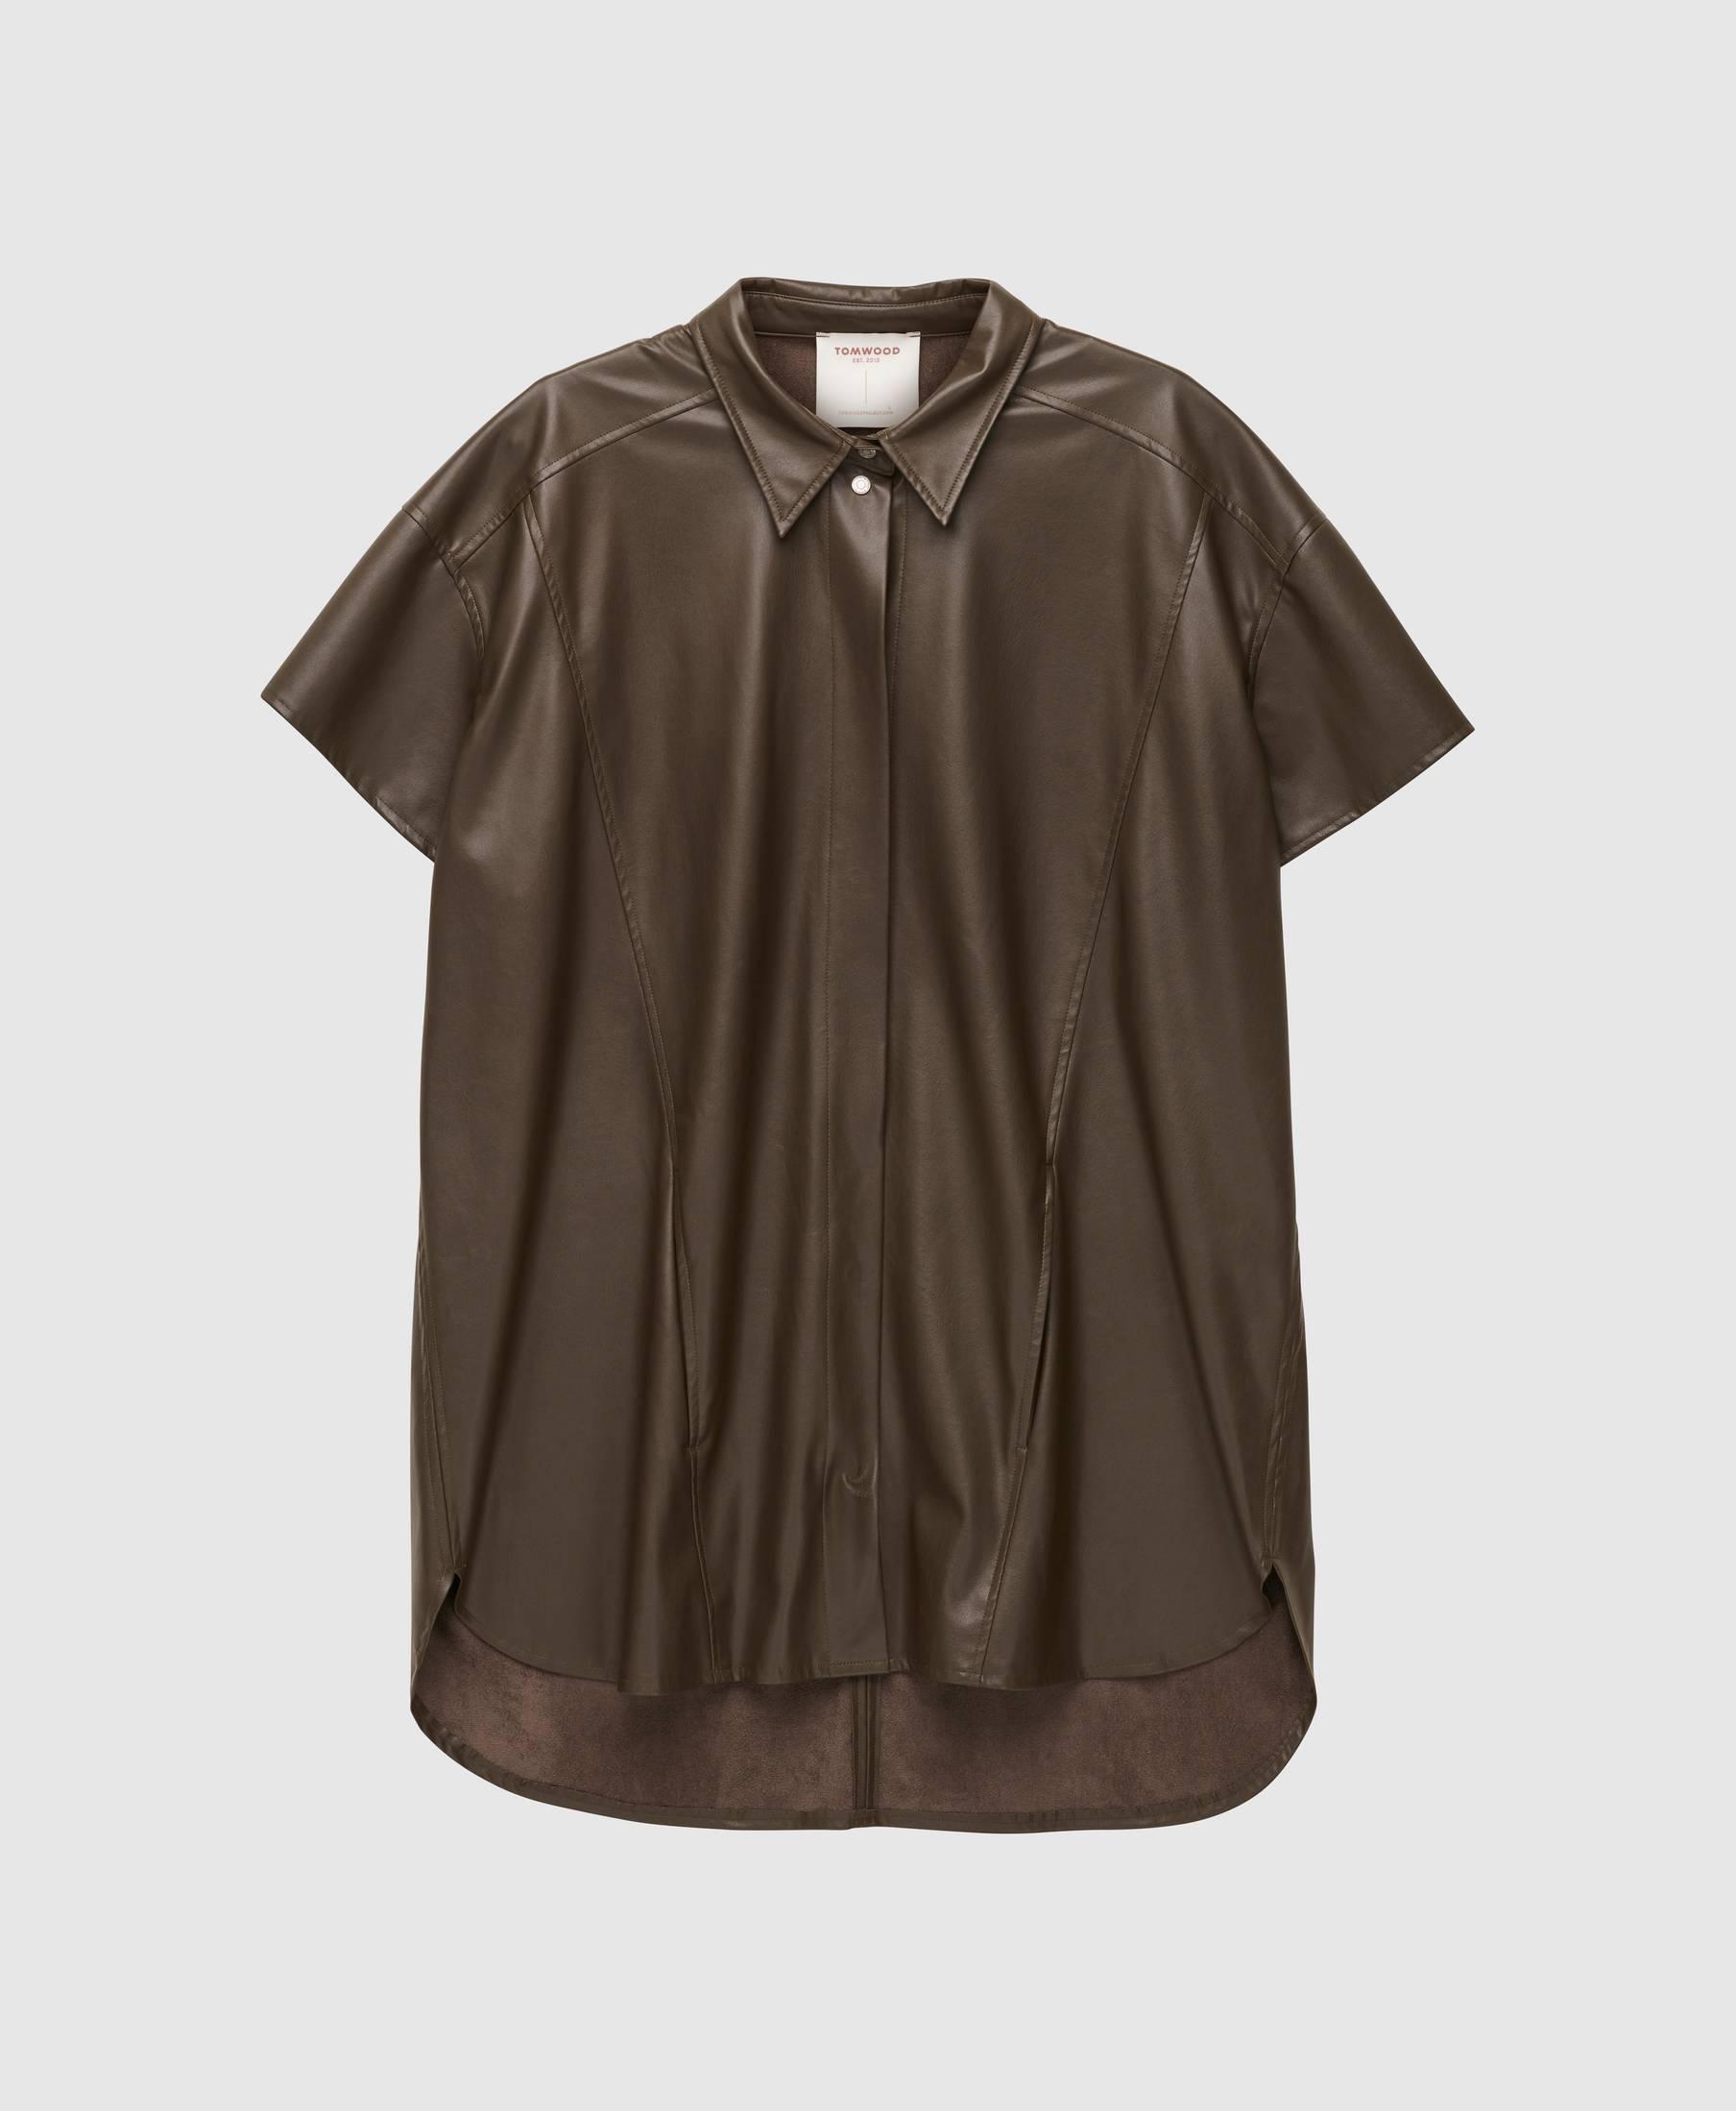 Harry Shirt Army Green